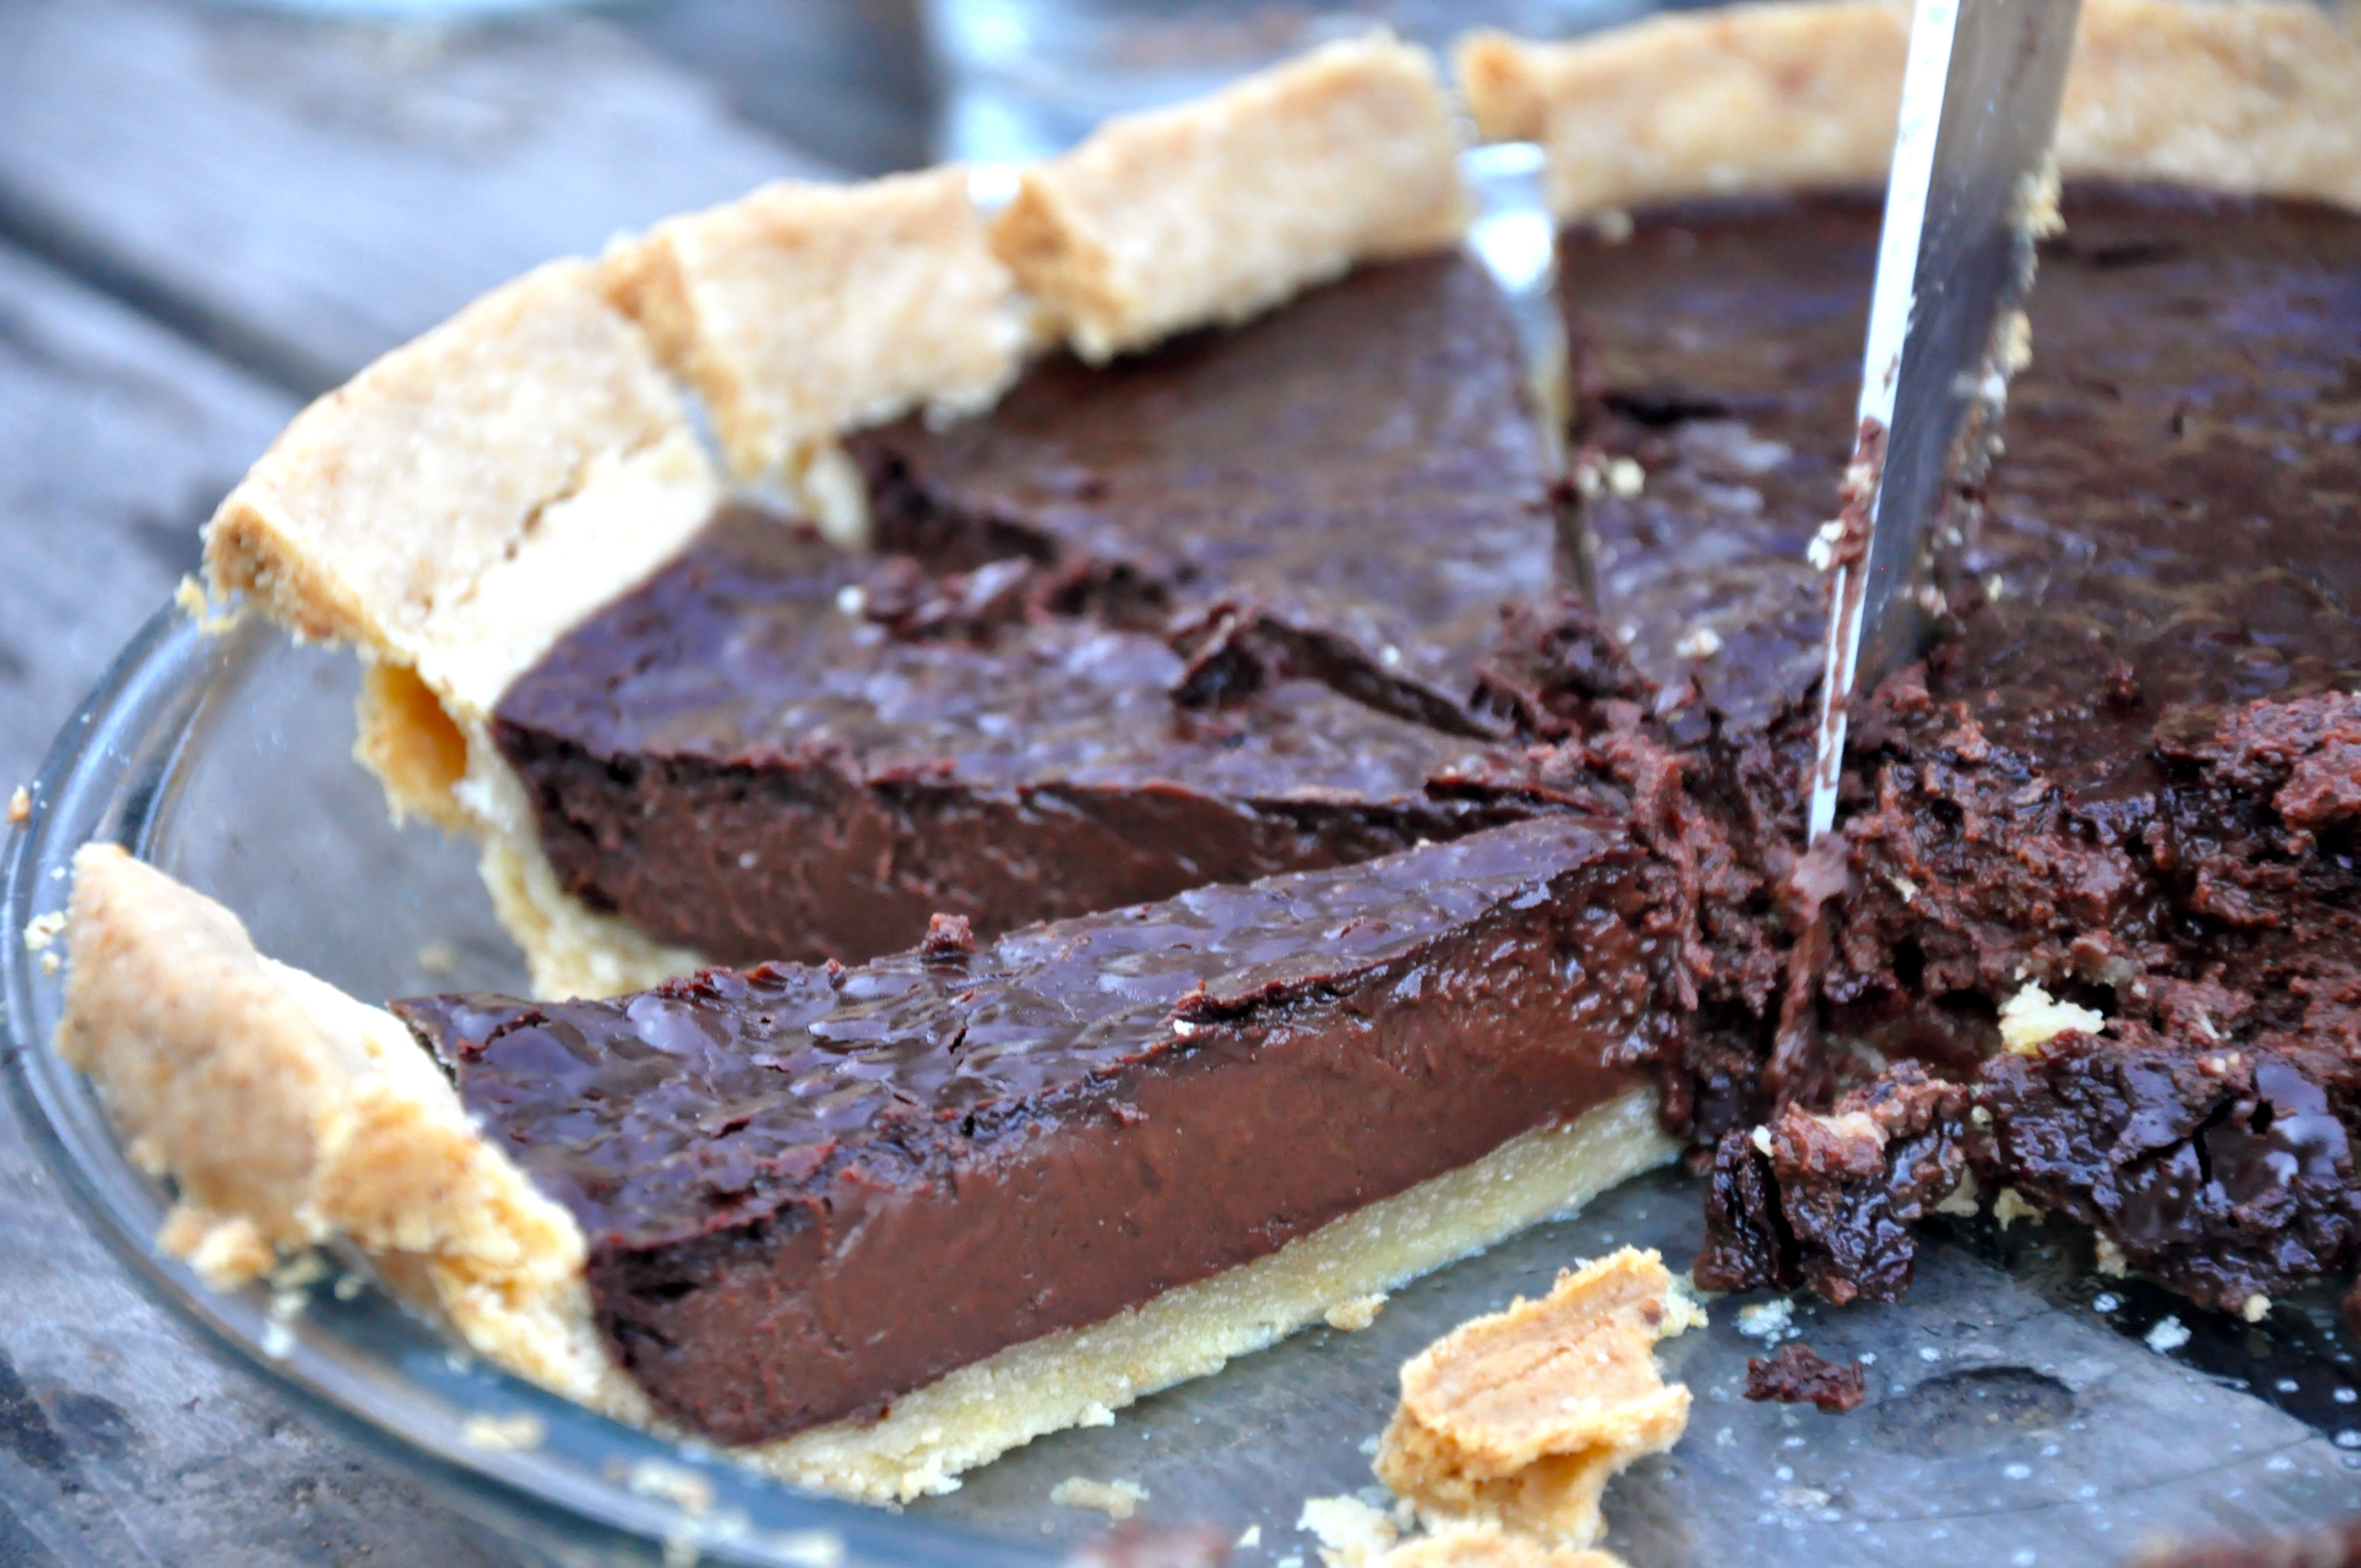 Tarte Au Chocolat: Chocolate Tart | Amy Glaze's Pommes D'Amour